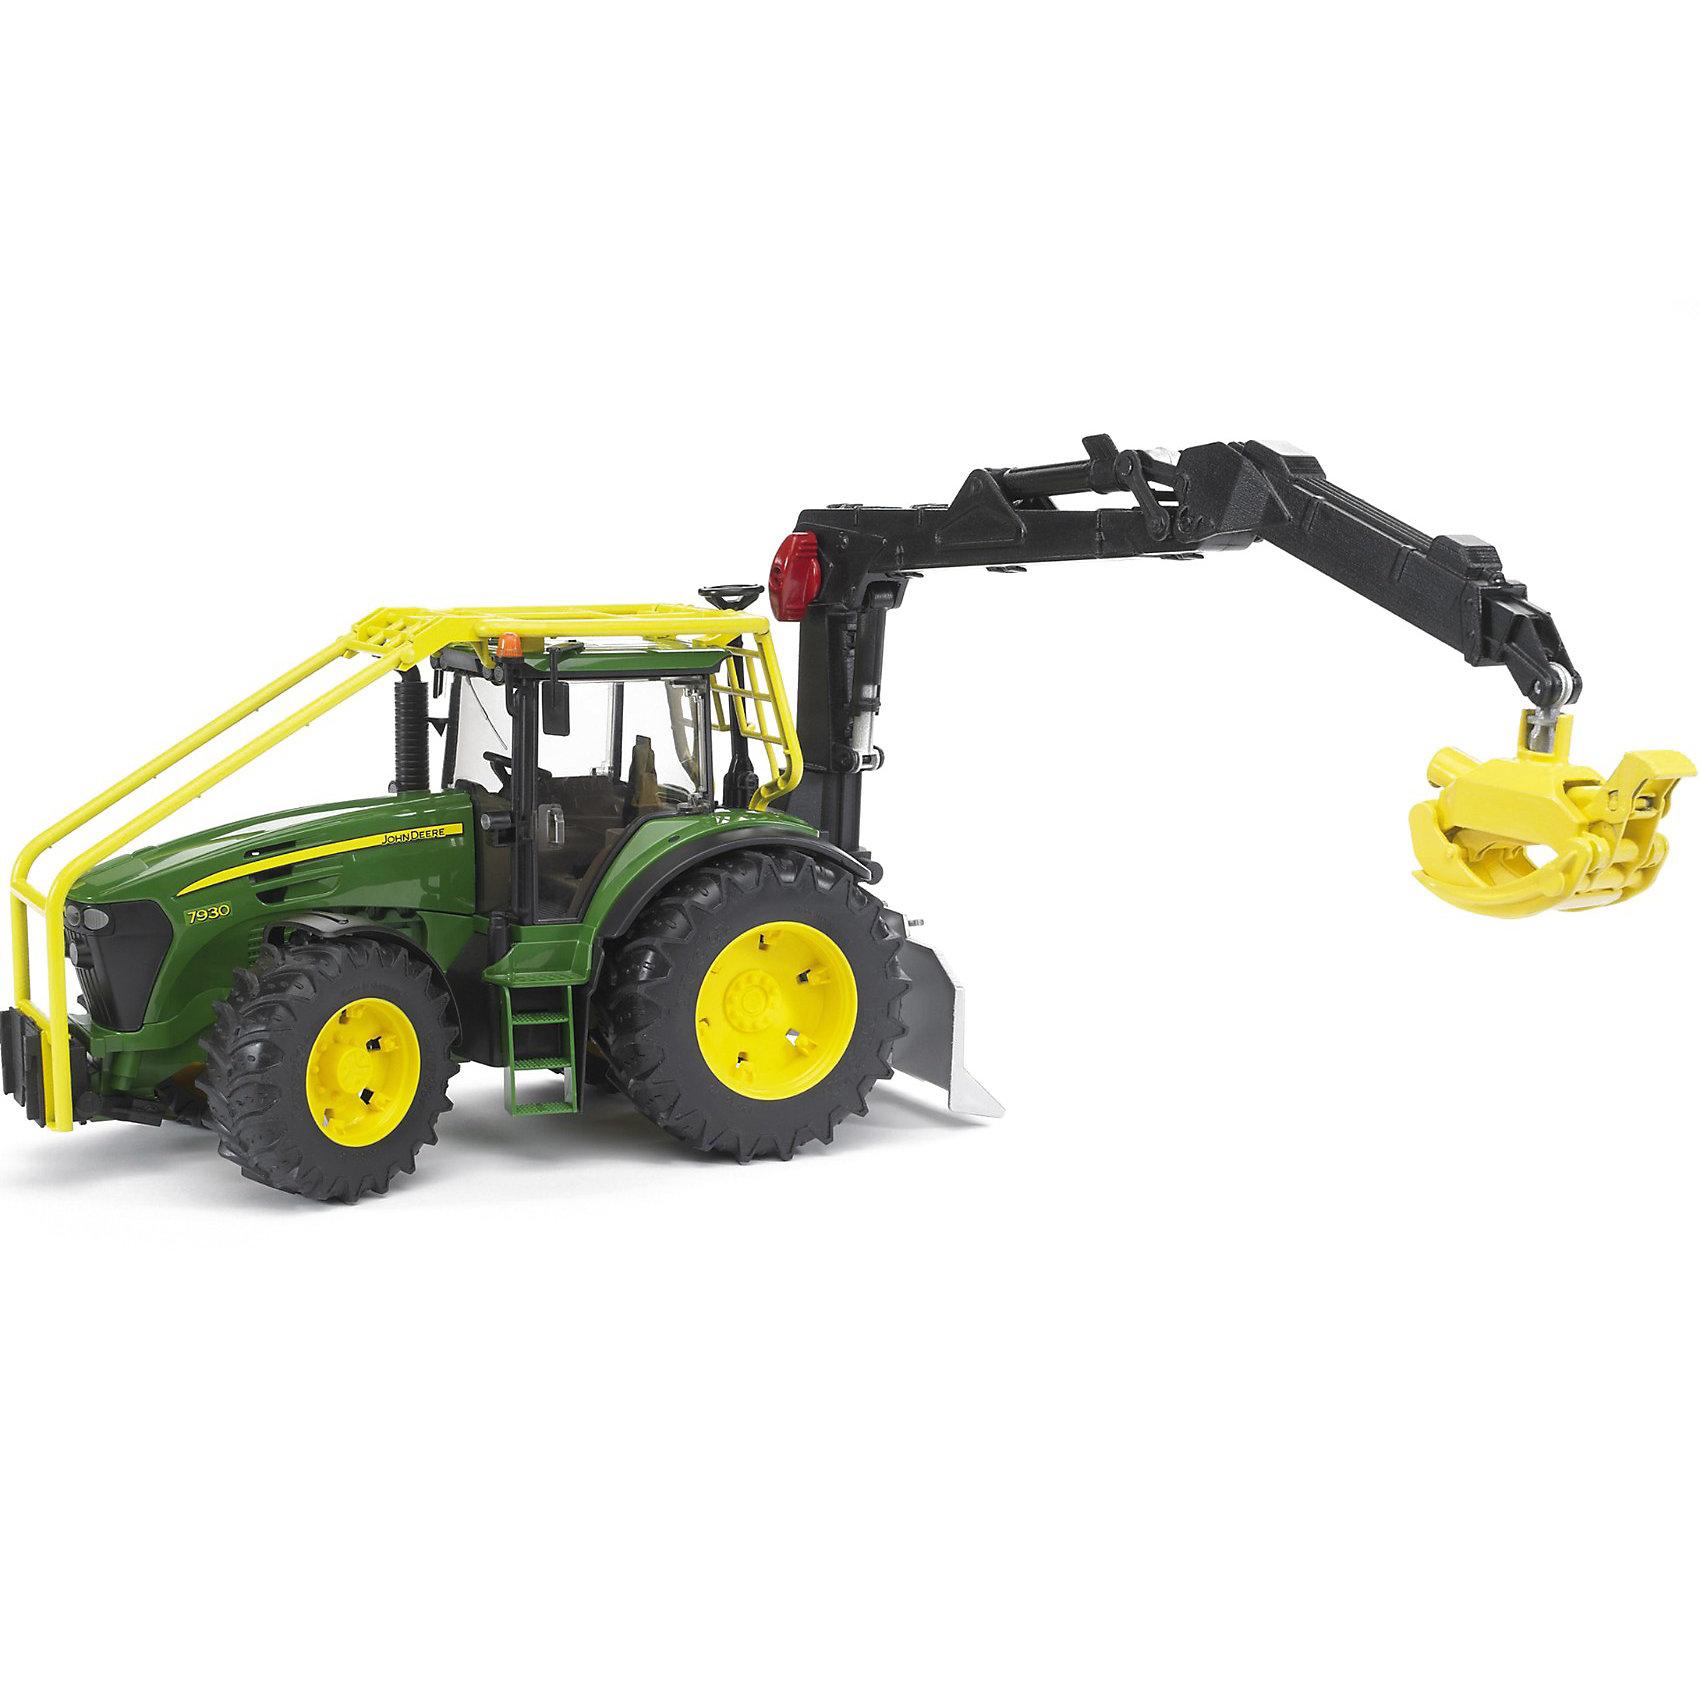 Bruder Трактор John Deere 7930 лесной с манипулятором, Bruder машины tomy трактор john deere 6830